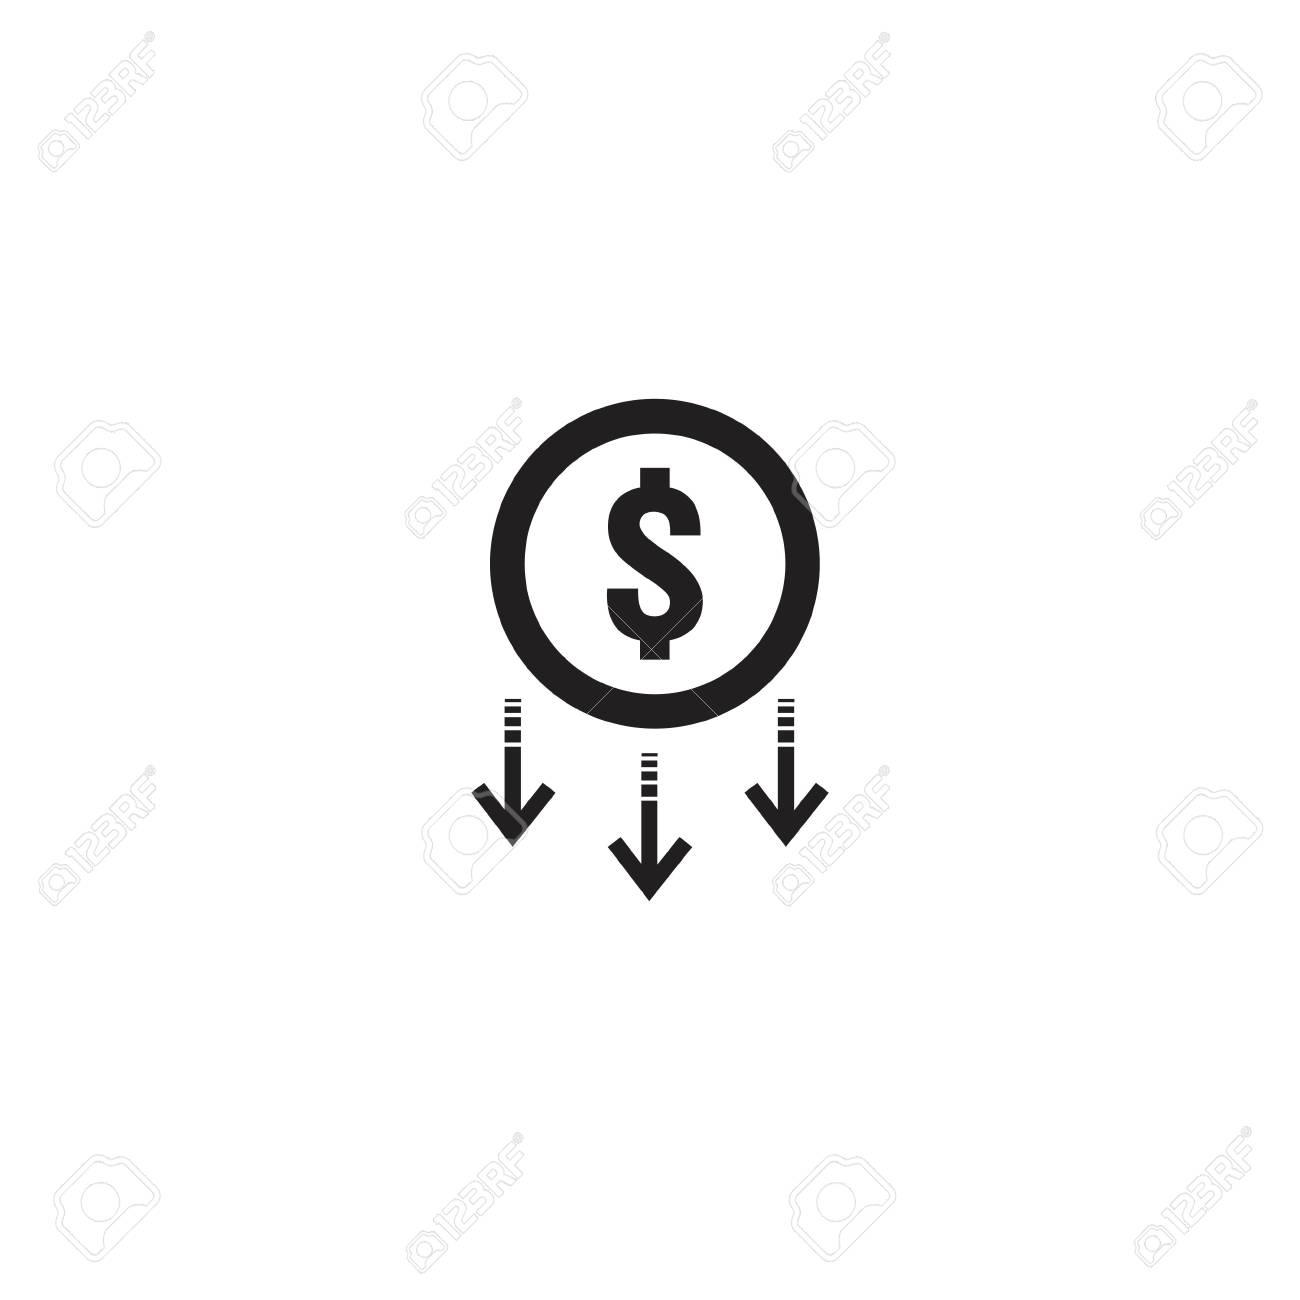 arrow decrease icon. dollar money fall down symbol. economy stretching rising drop. Business lost crisis decrease. cost reduction bankrupt icon. vector illustration. - 110406369